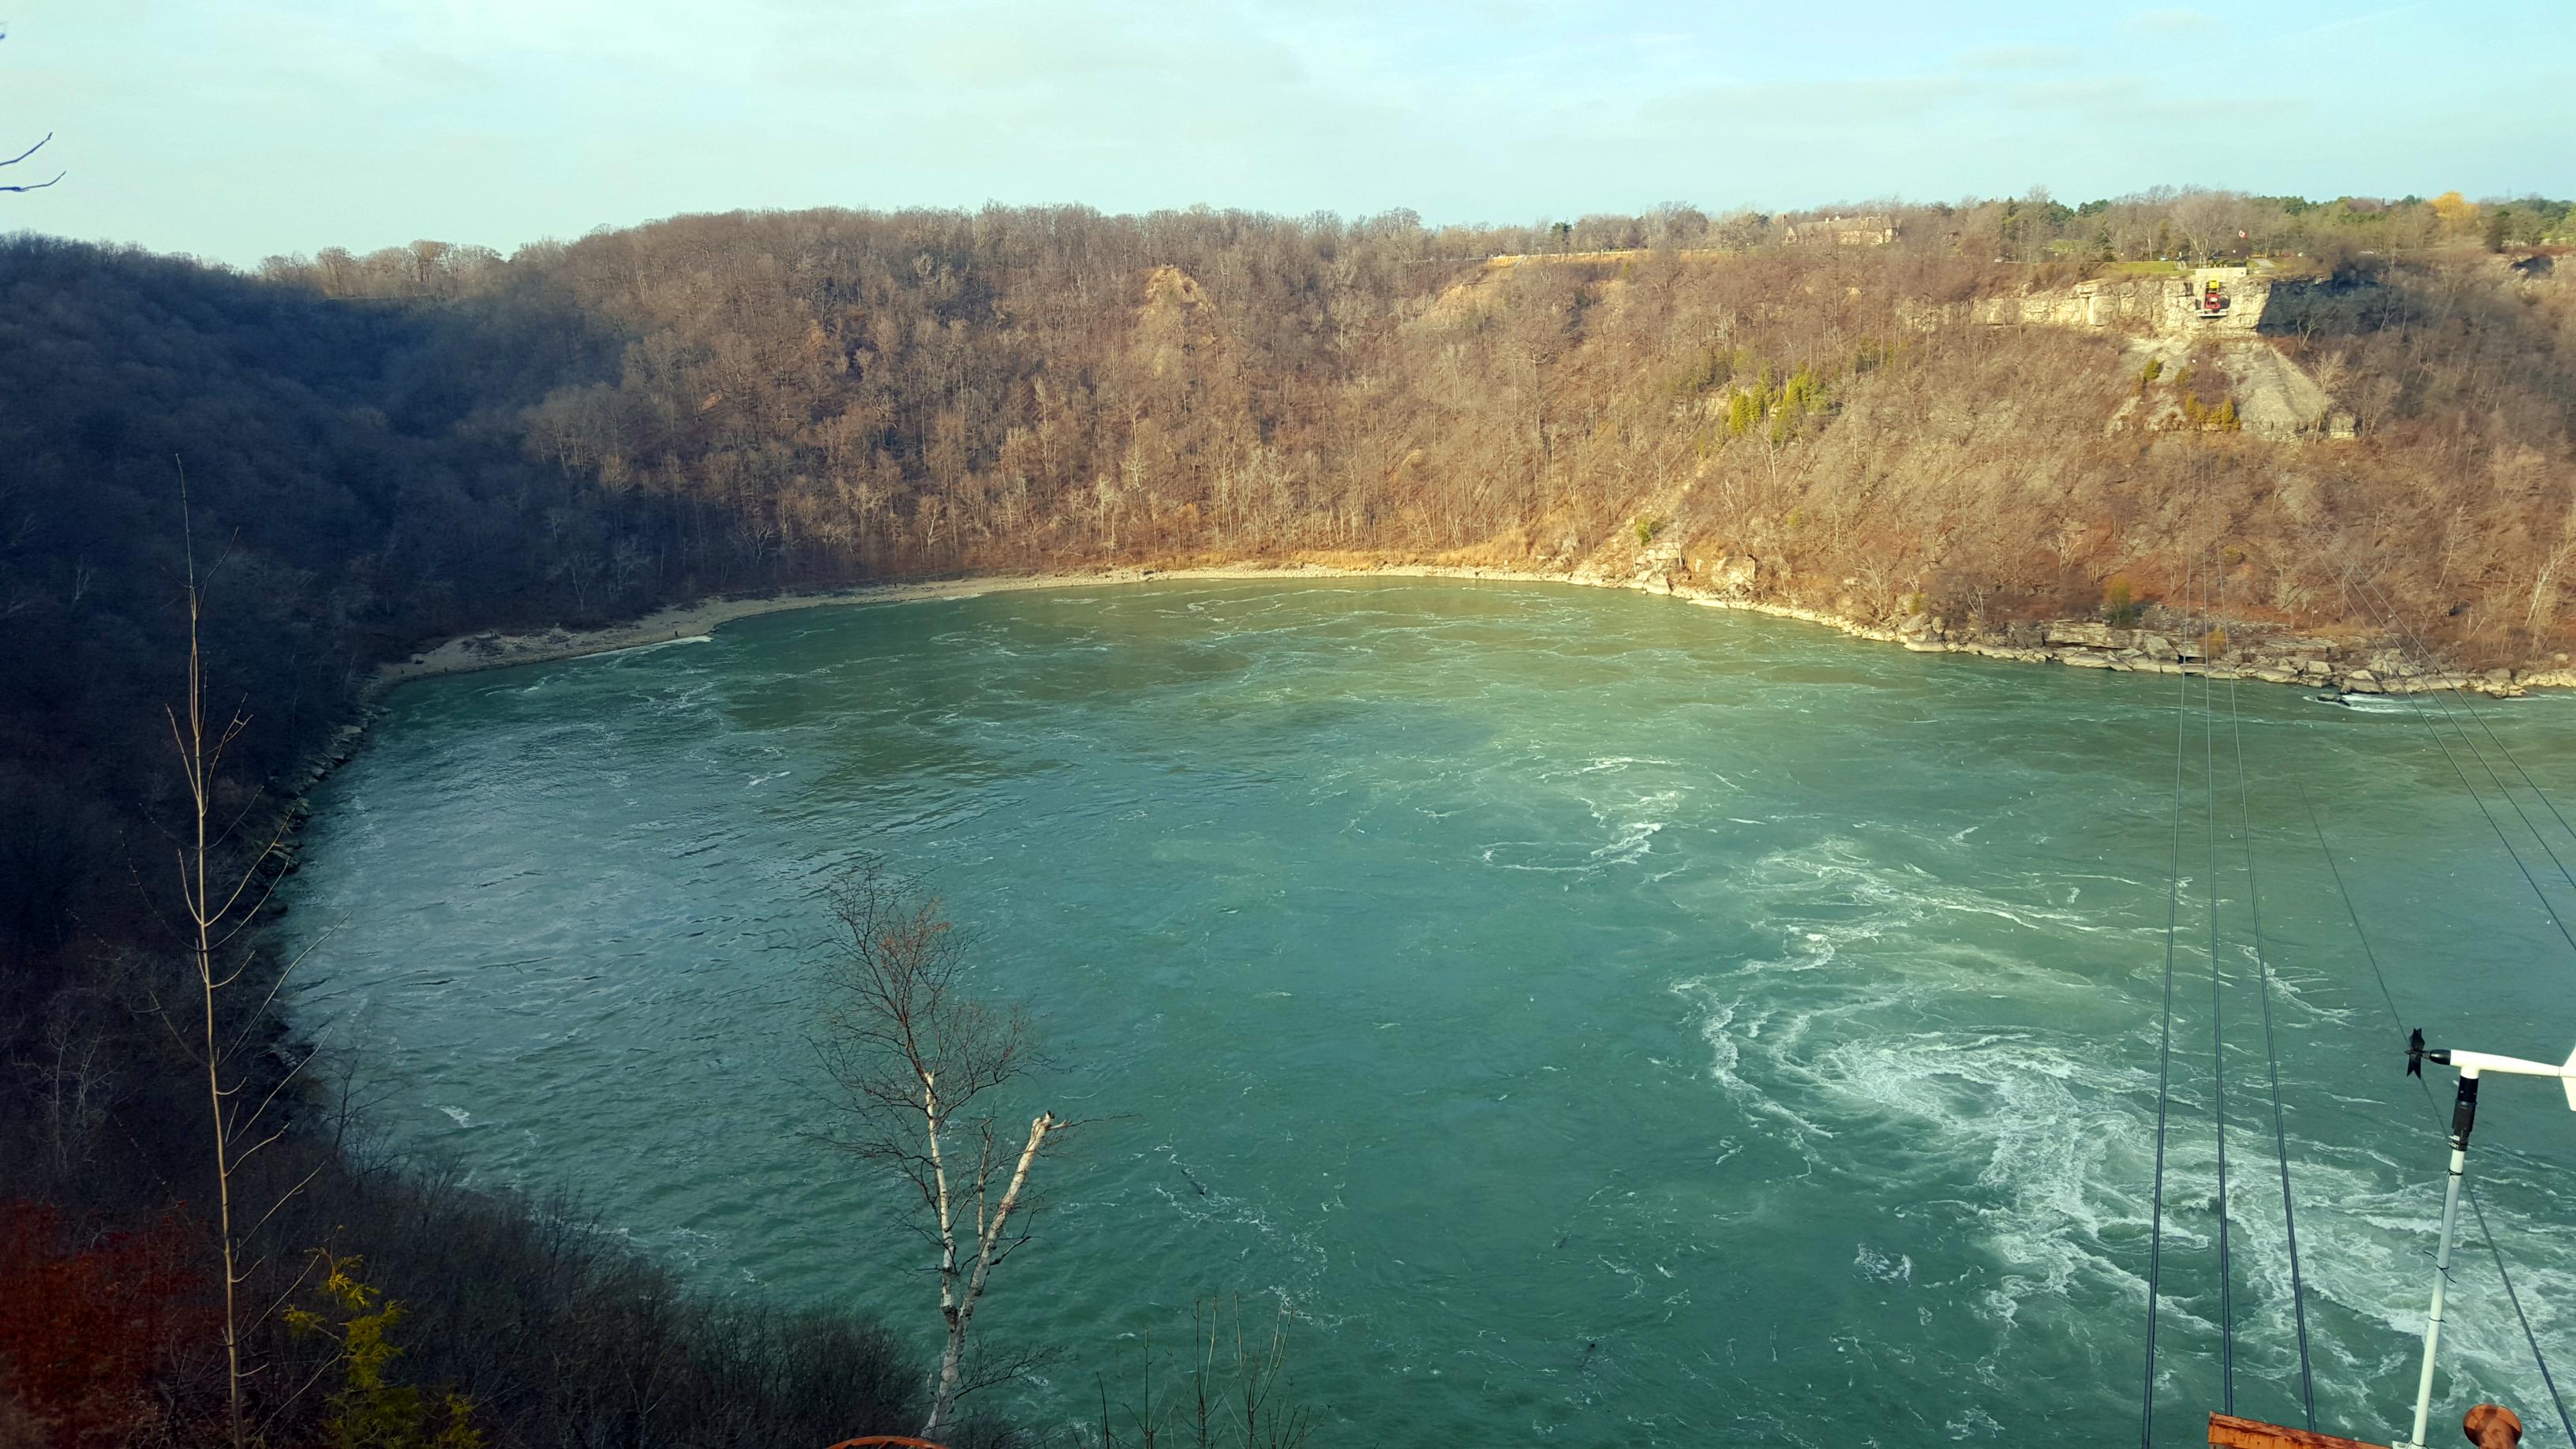 Whirlpool at Niagara Falls